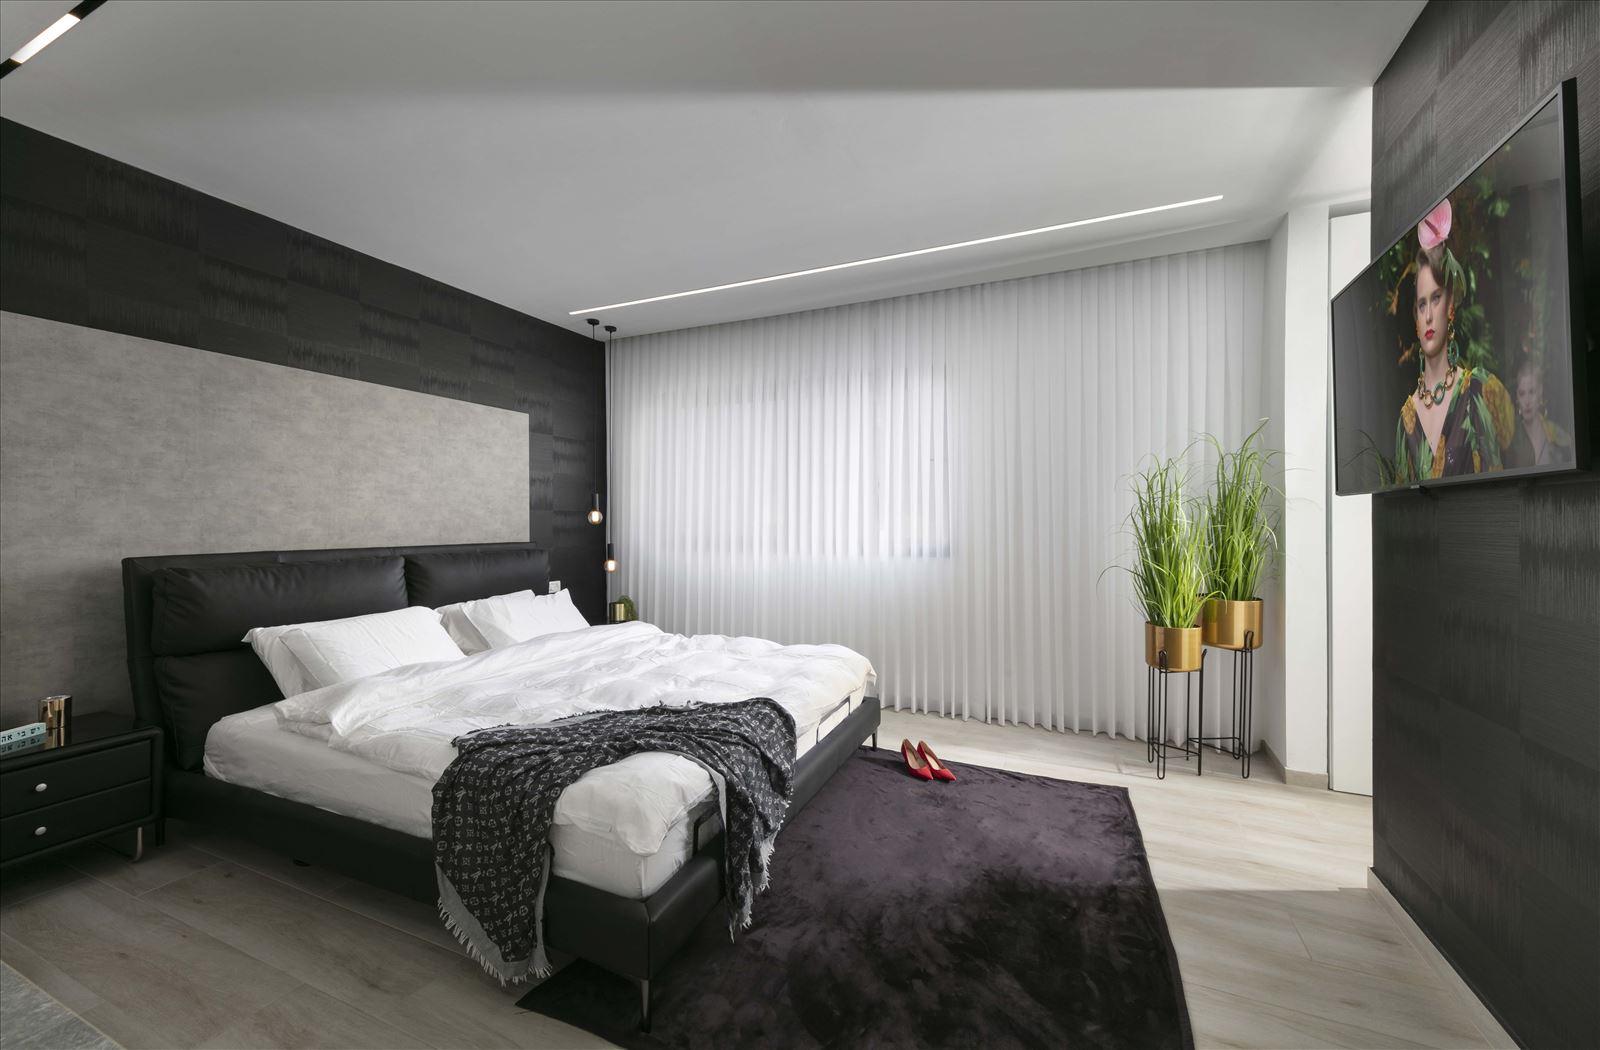 Lighting project private house תאורה חדר השינה נעשתה על ידי דורי קמחי